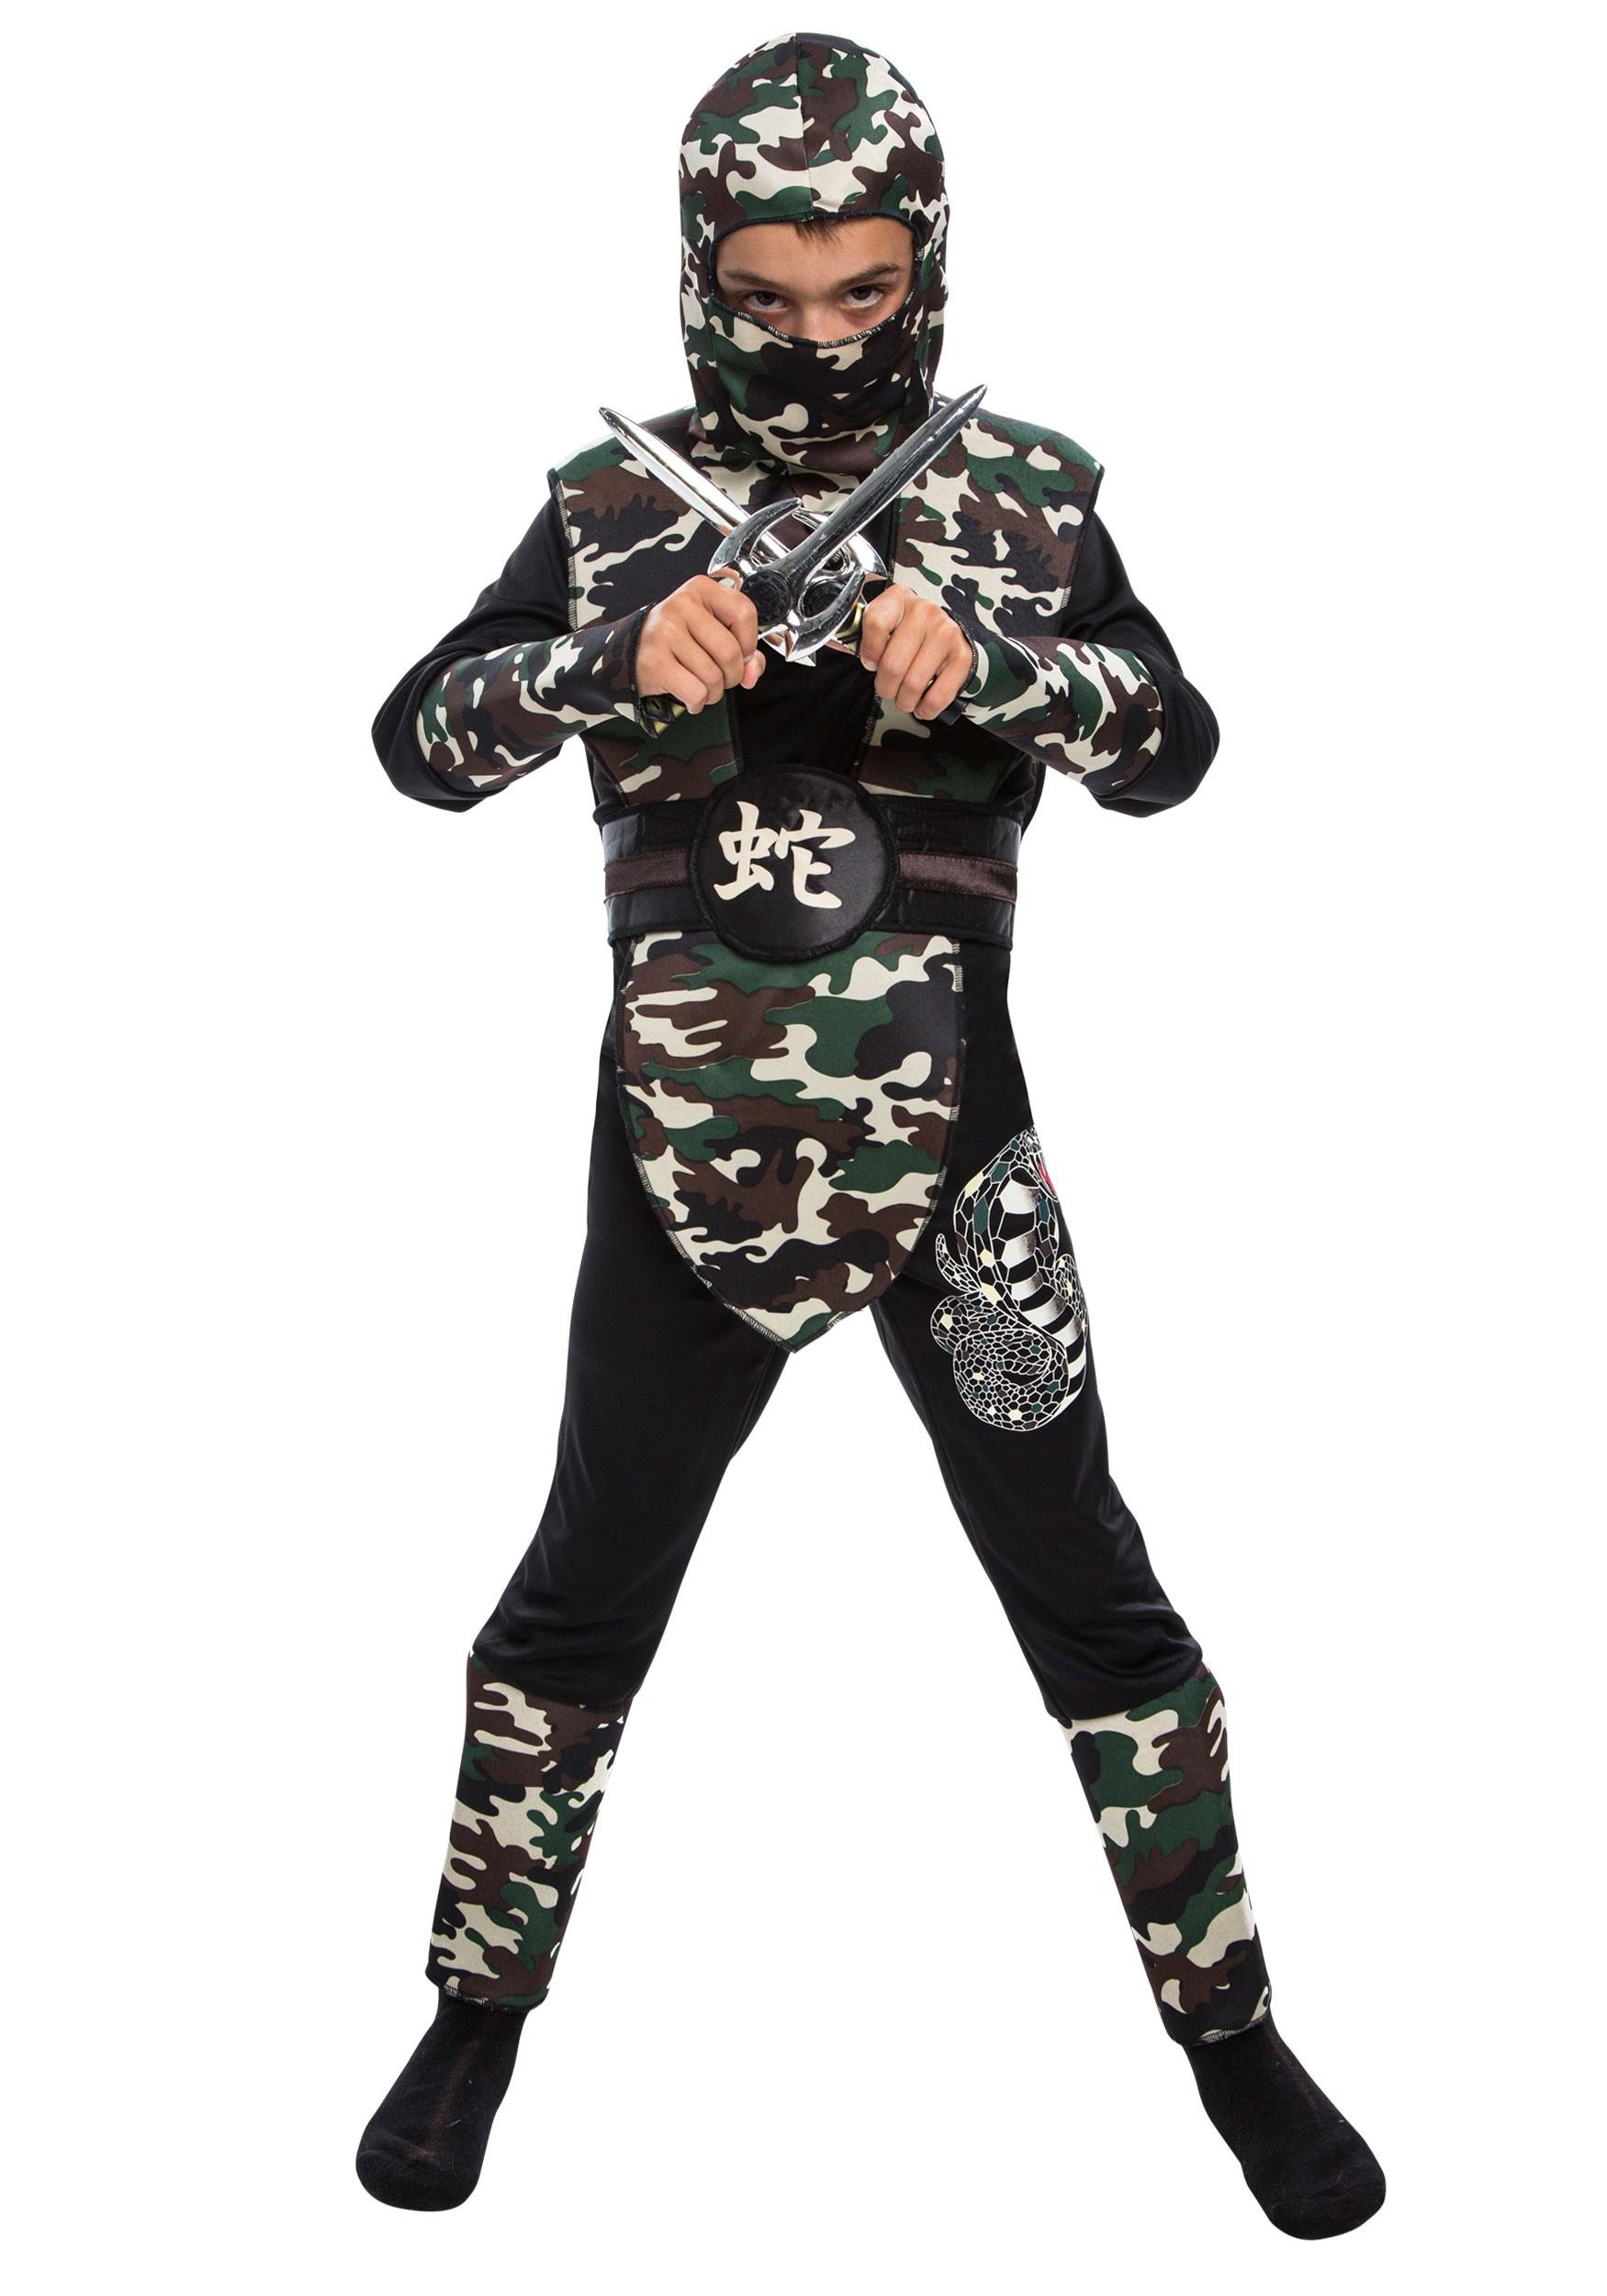 sc 1 st  Halloween Costumes & Boyu0027s Camo Ninja Costume